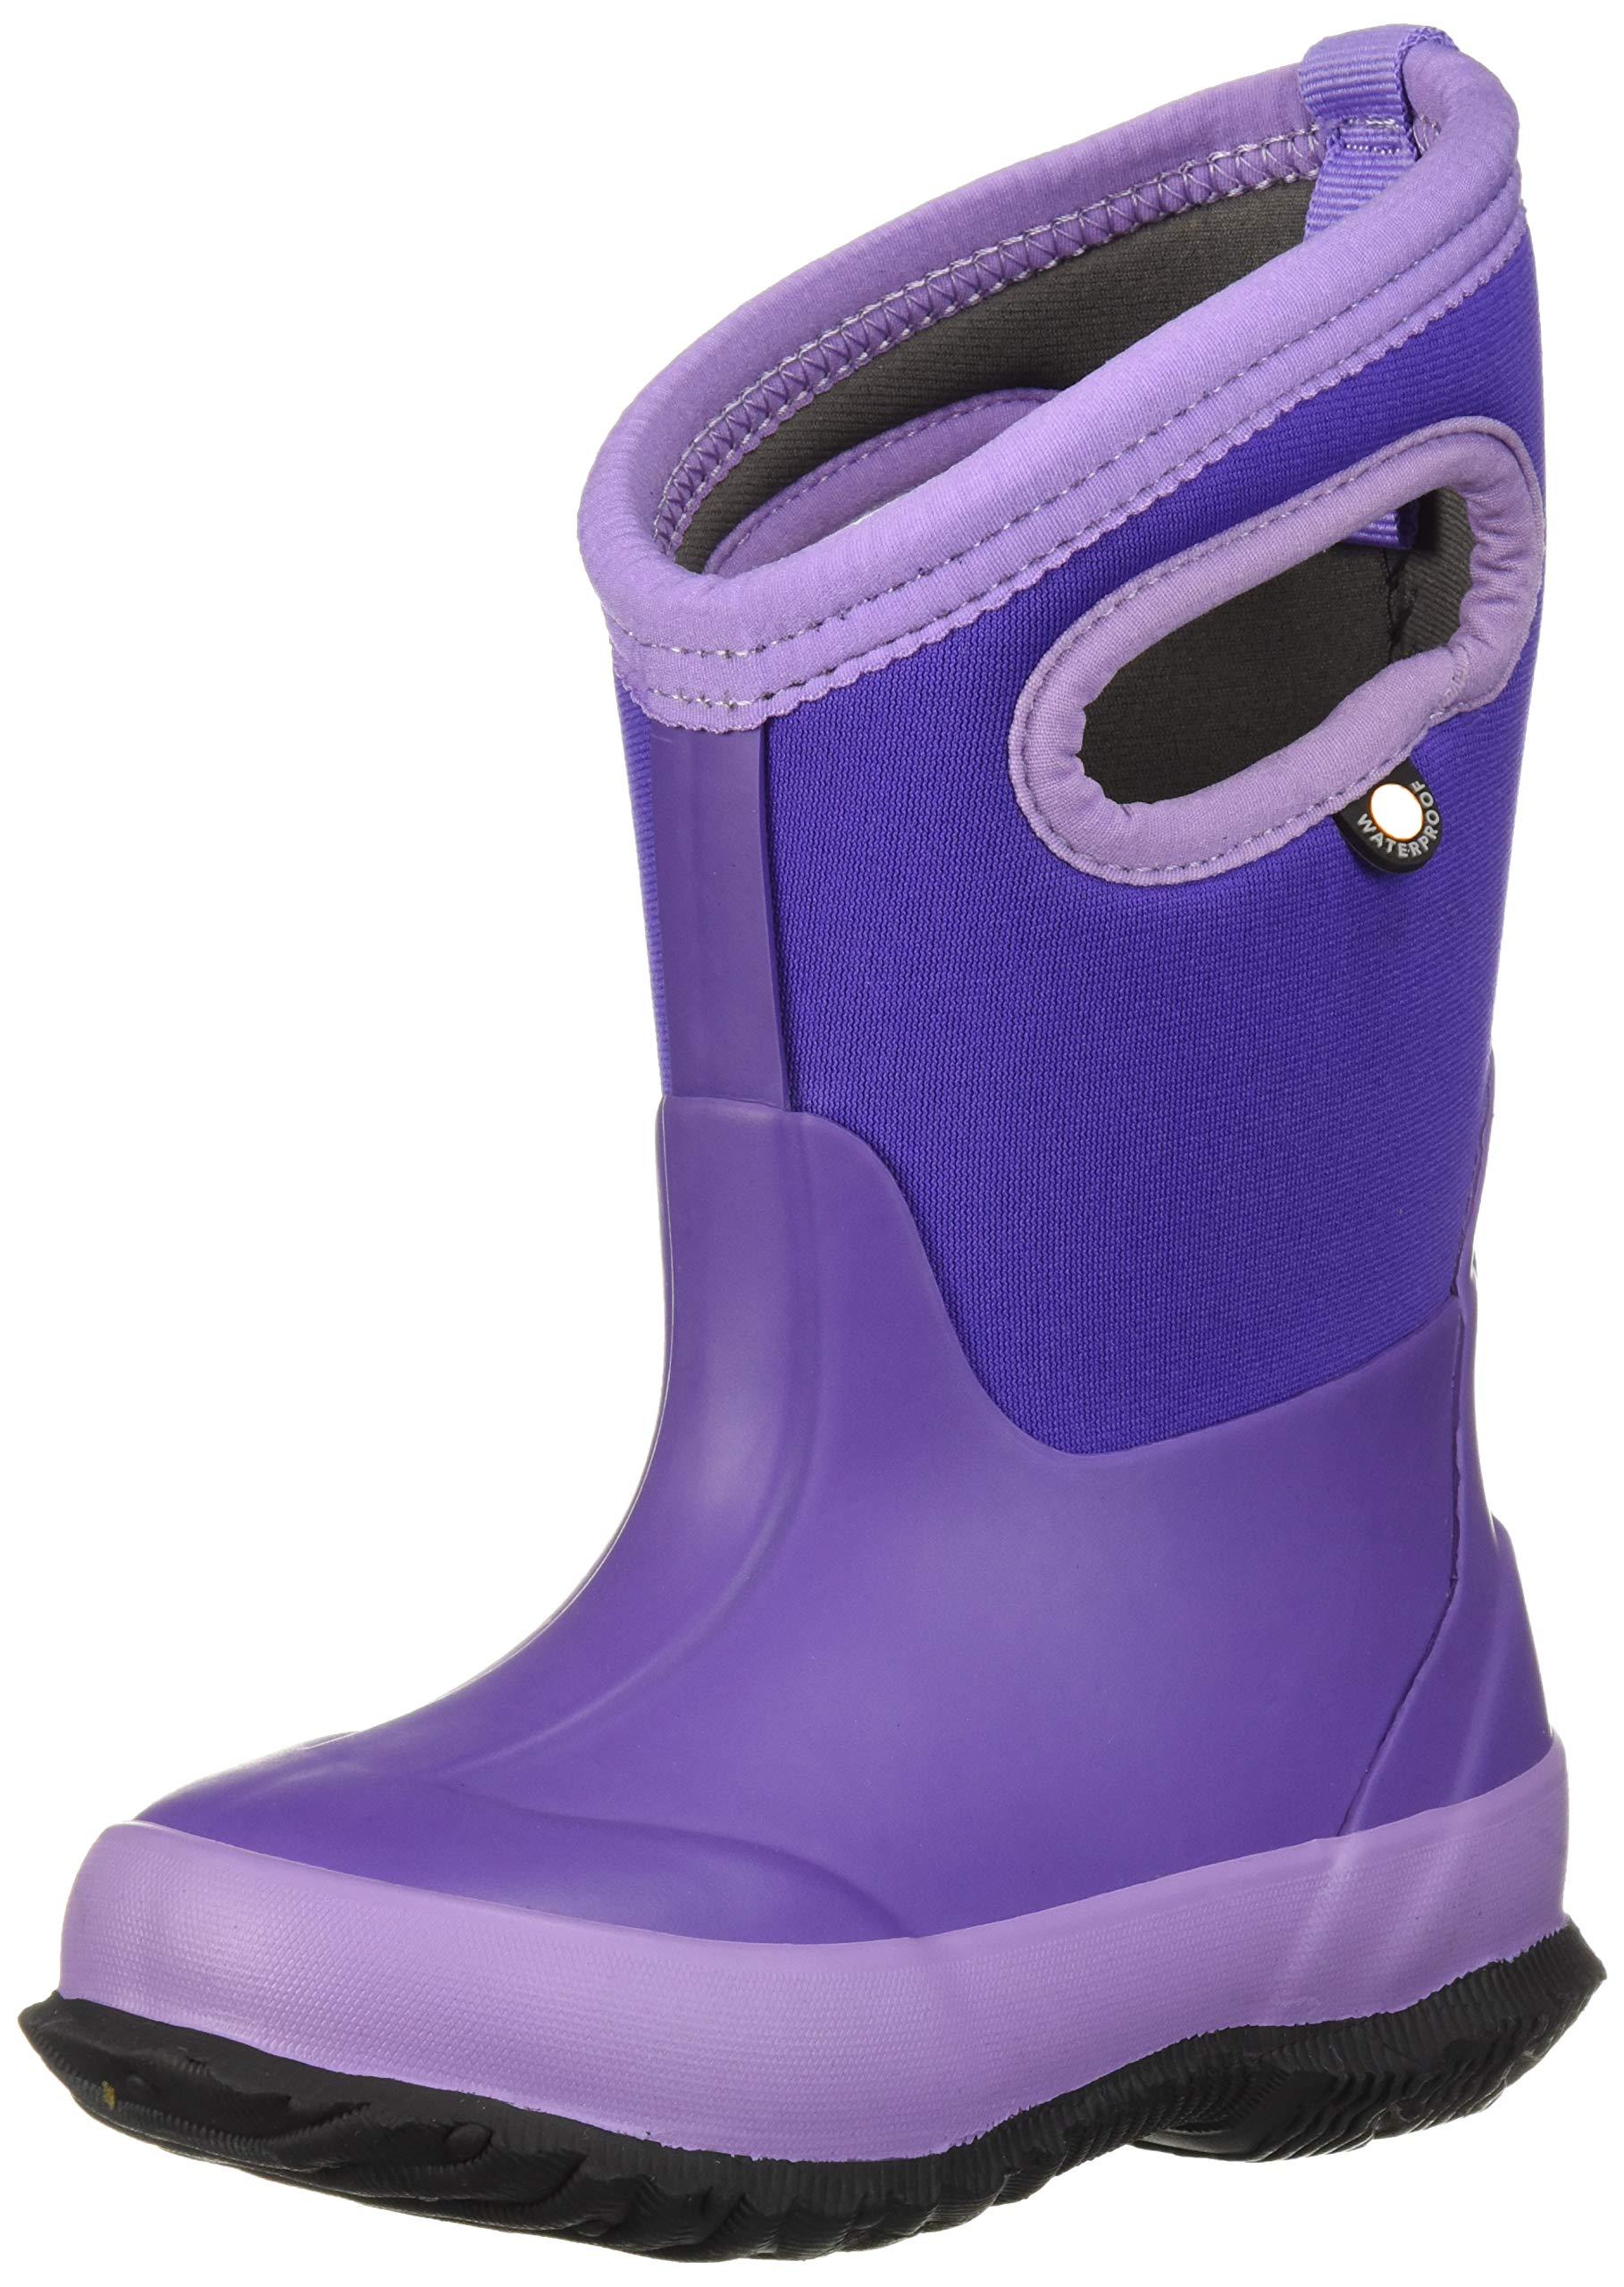 Bogs Classic High Waterproof Insulated Rubber Neoprene Rain Boot Snow, Matte Violet, 5 M US Big Kid